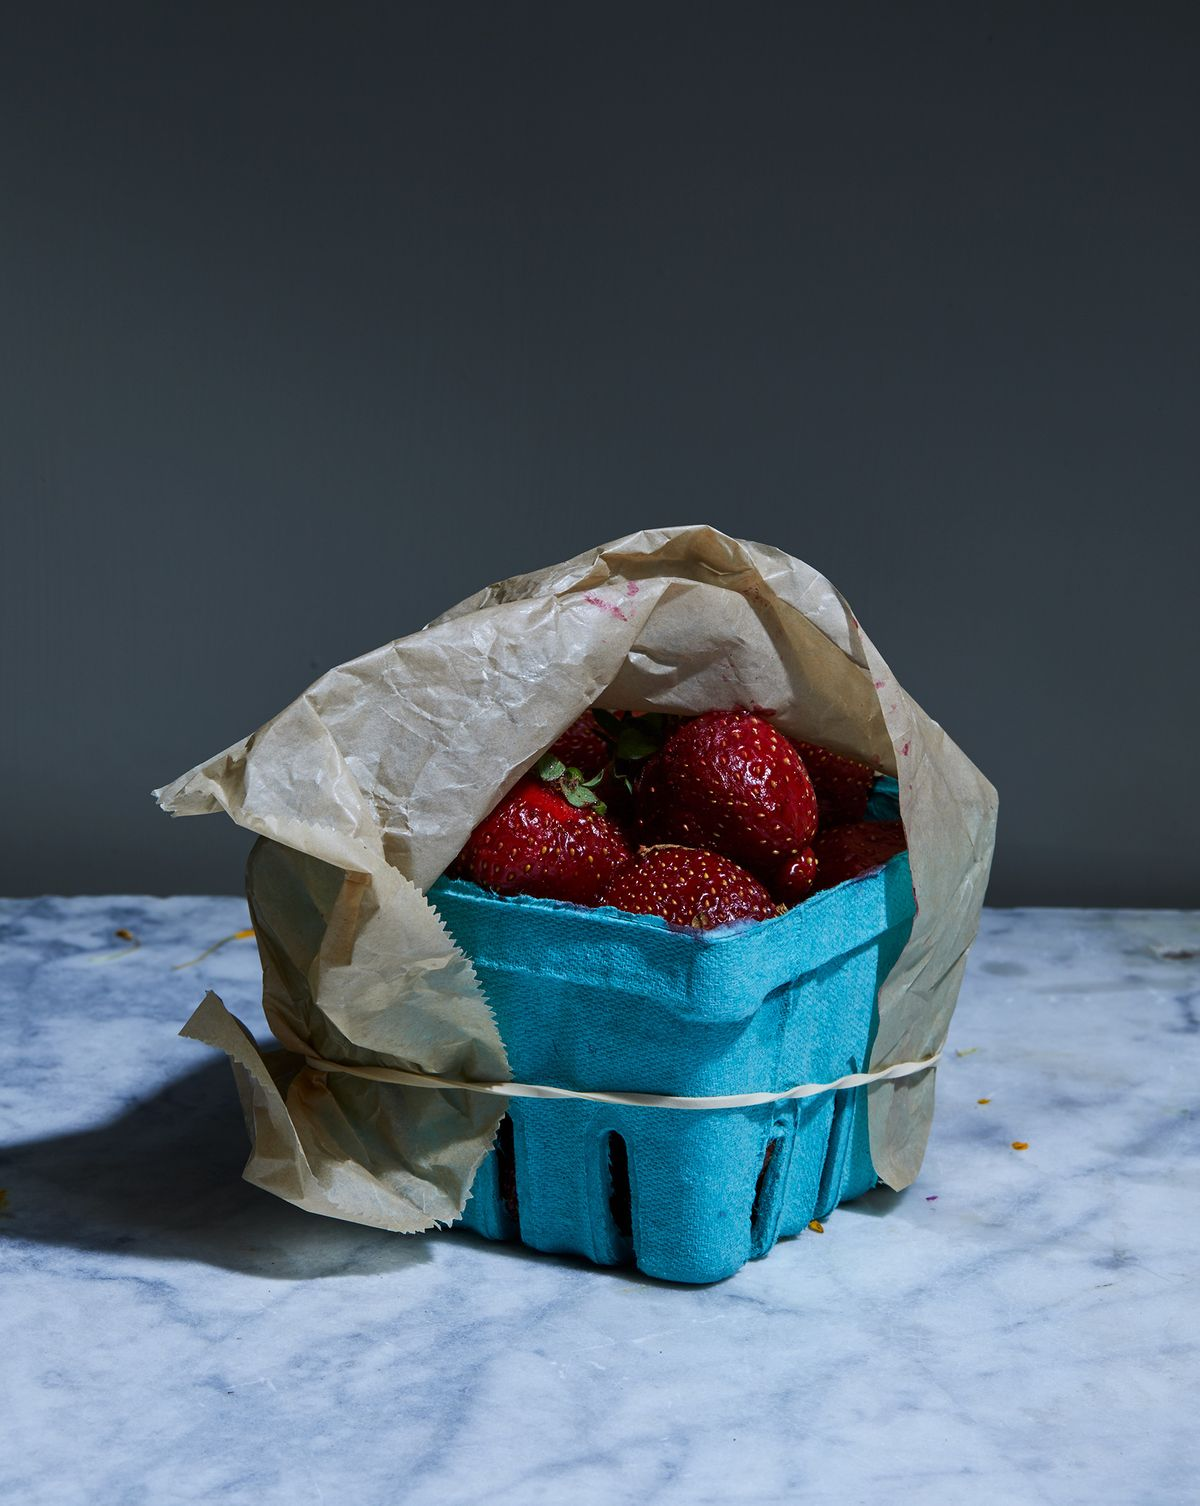 Strawberries_Summer_Stills_18_36255.jpg